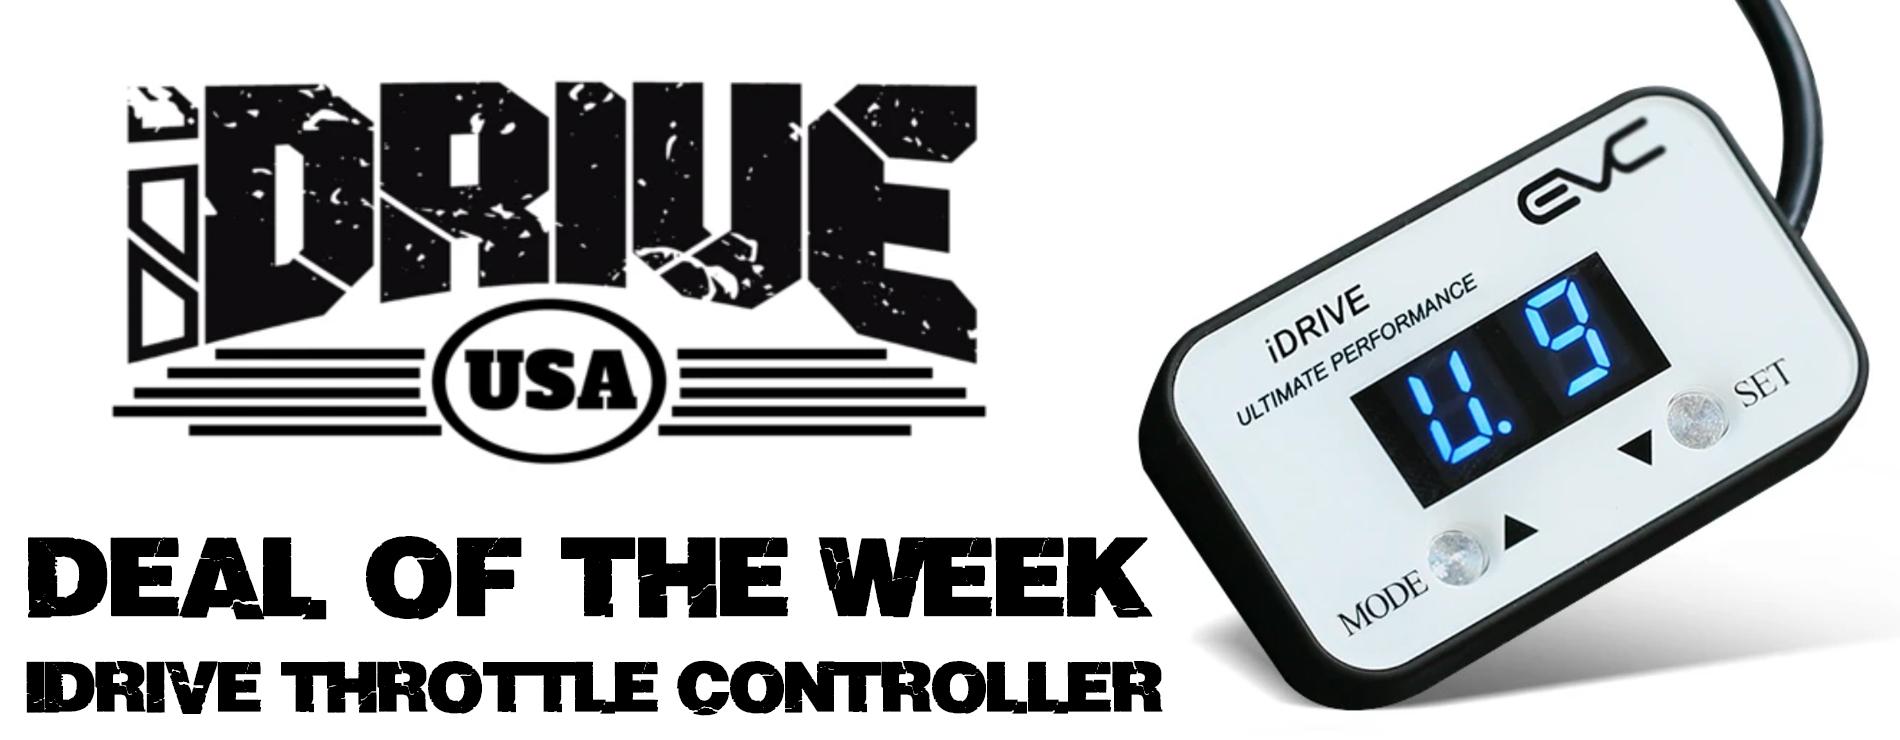 Deal Of The Week iDrive USA